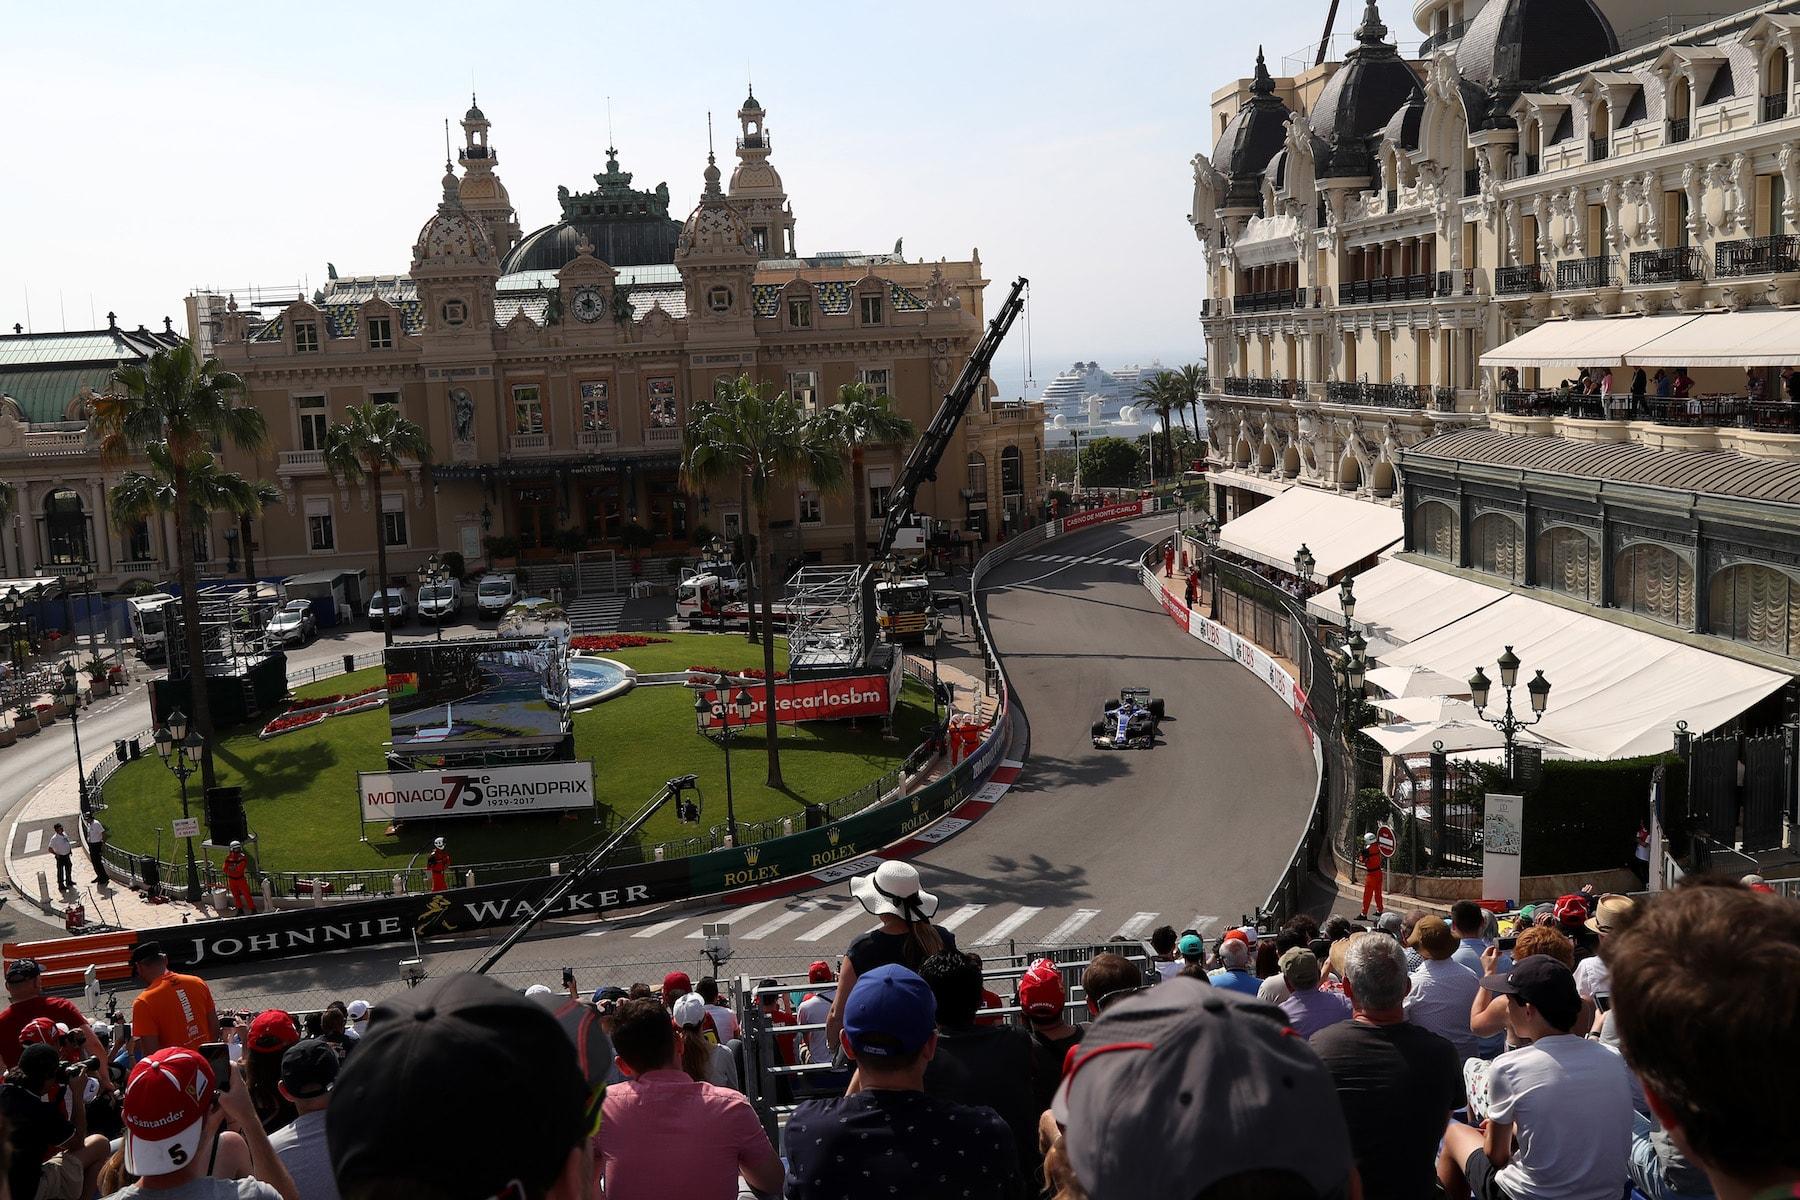 2017 Pascal Wehrlein | Sauber C36 | 2017 Monaco GP FP2 12017 Pascal Wehrlein | Sauber C36 | 2017 Monaco GP FP2 1 copy.jpg